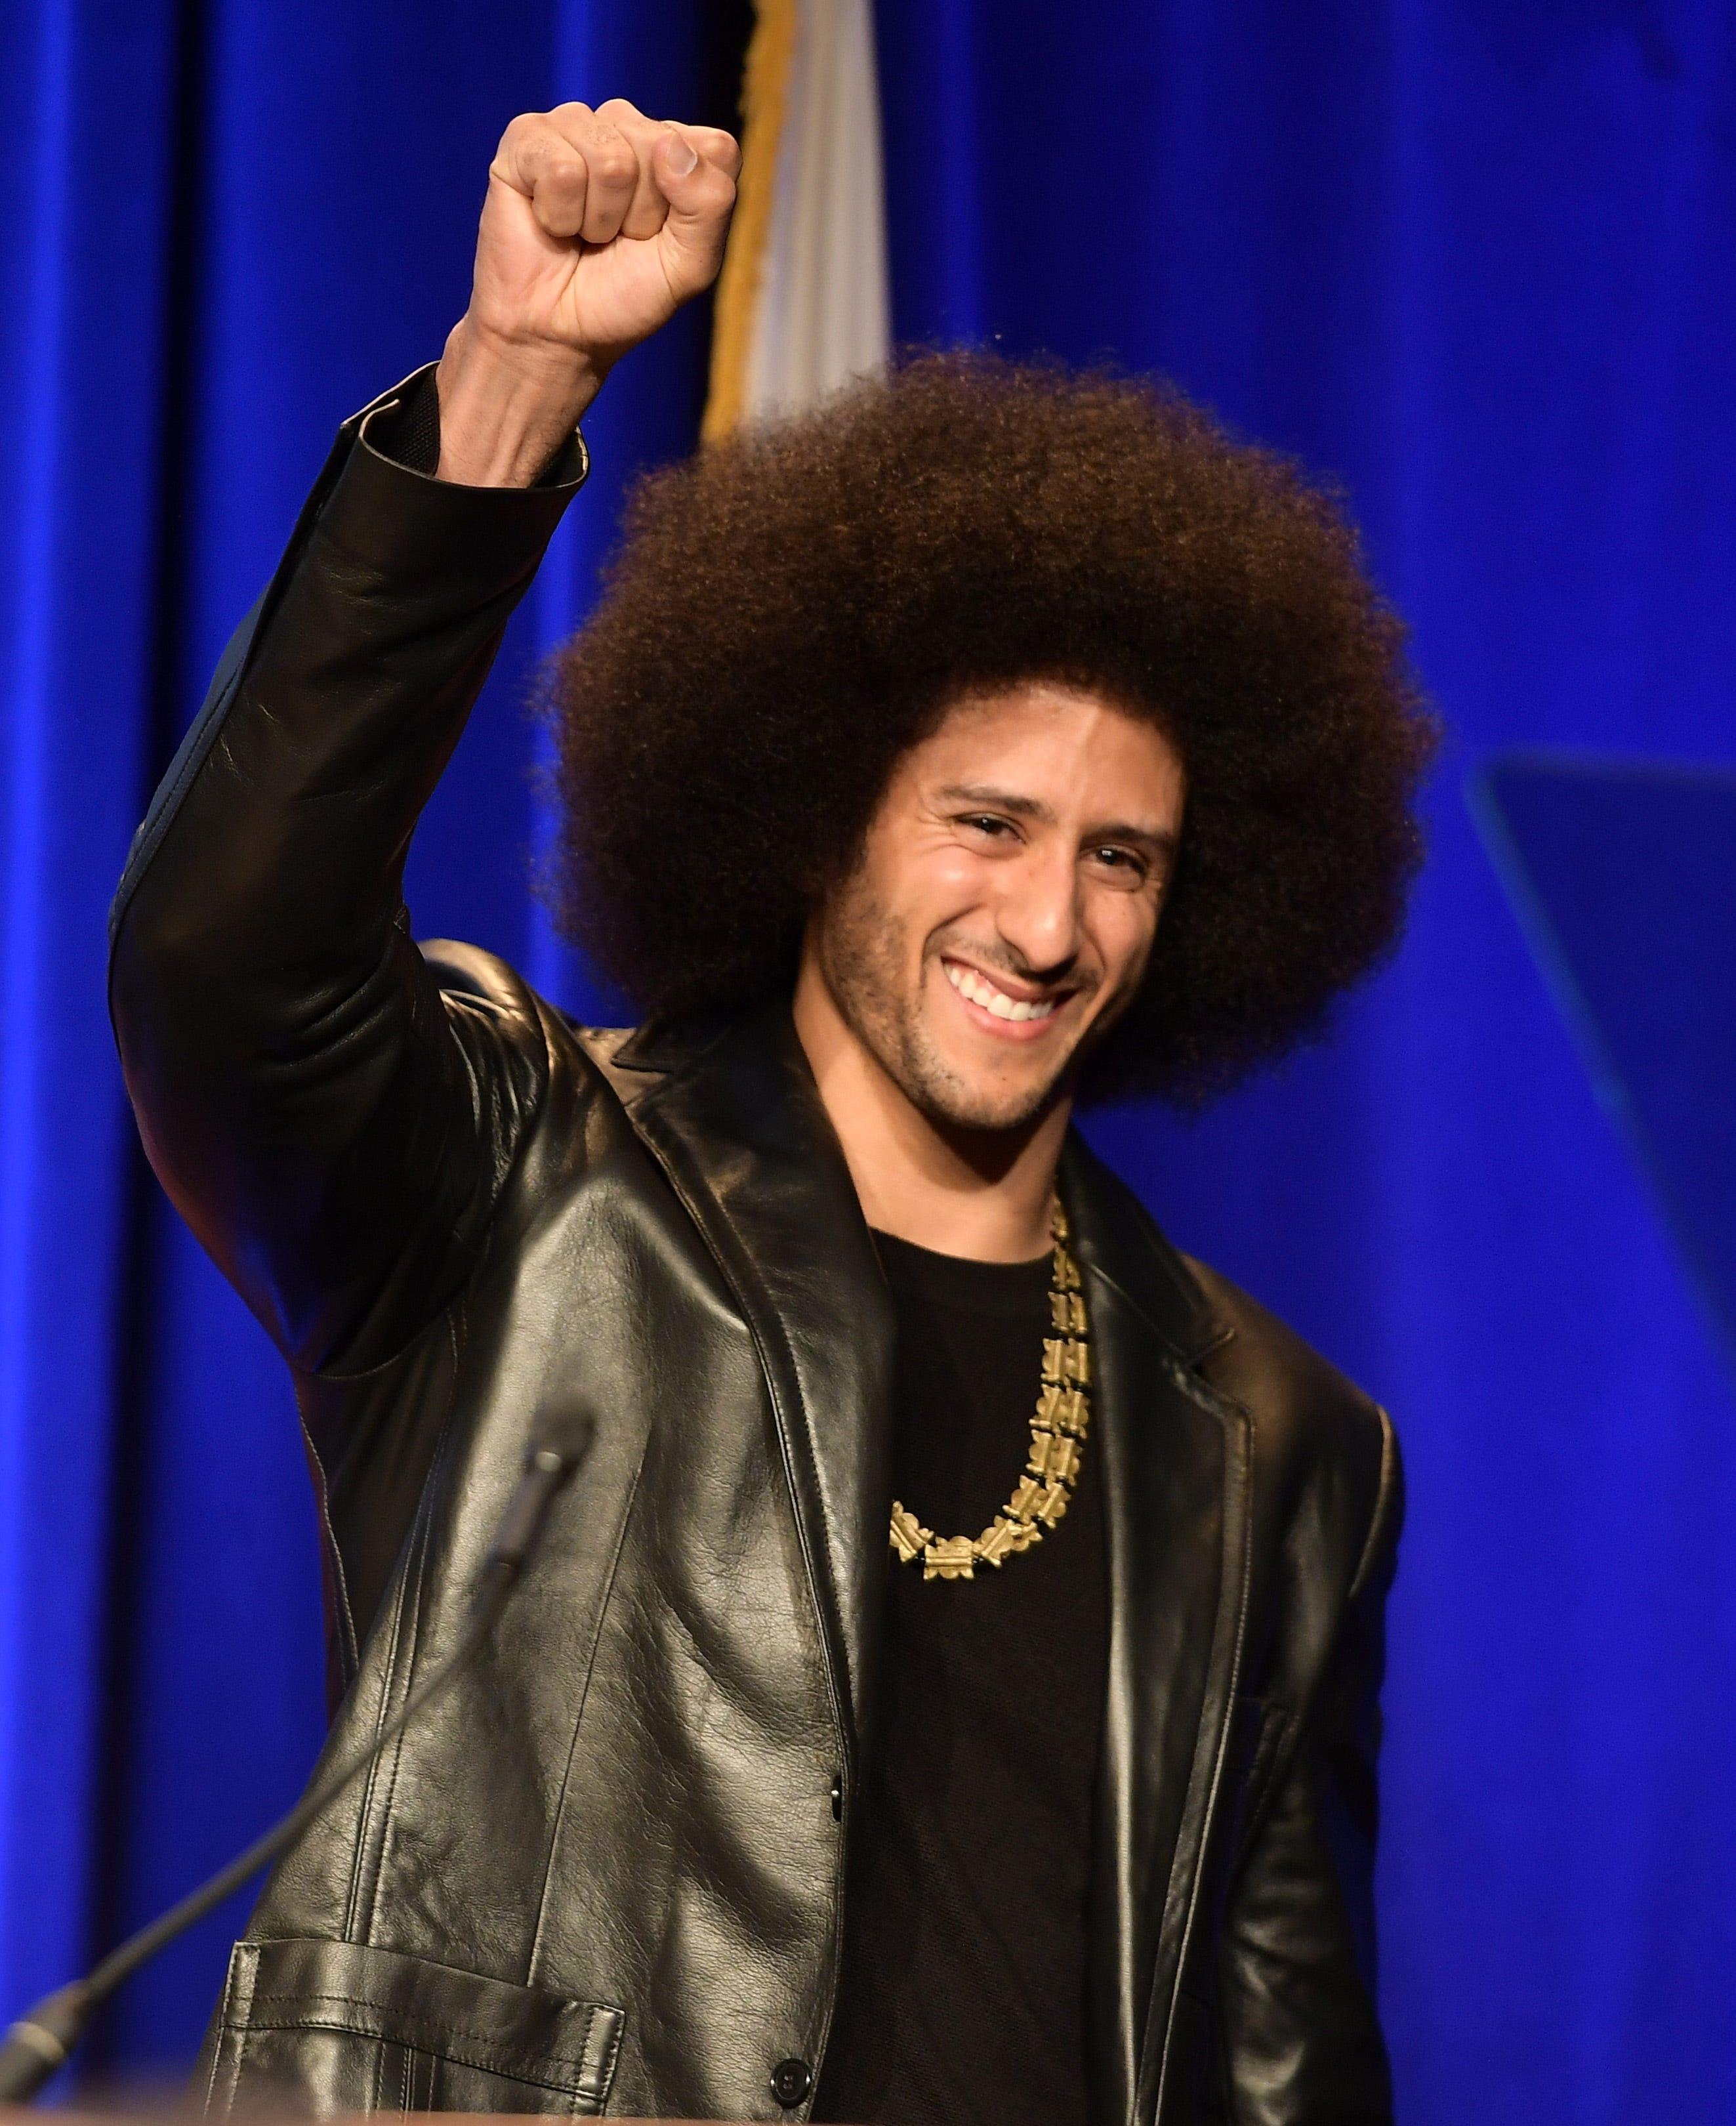 Colin Kaepernick, Dave Chappelle getting Harvard black culture awards